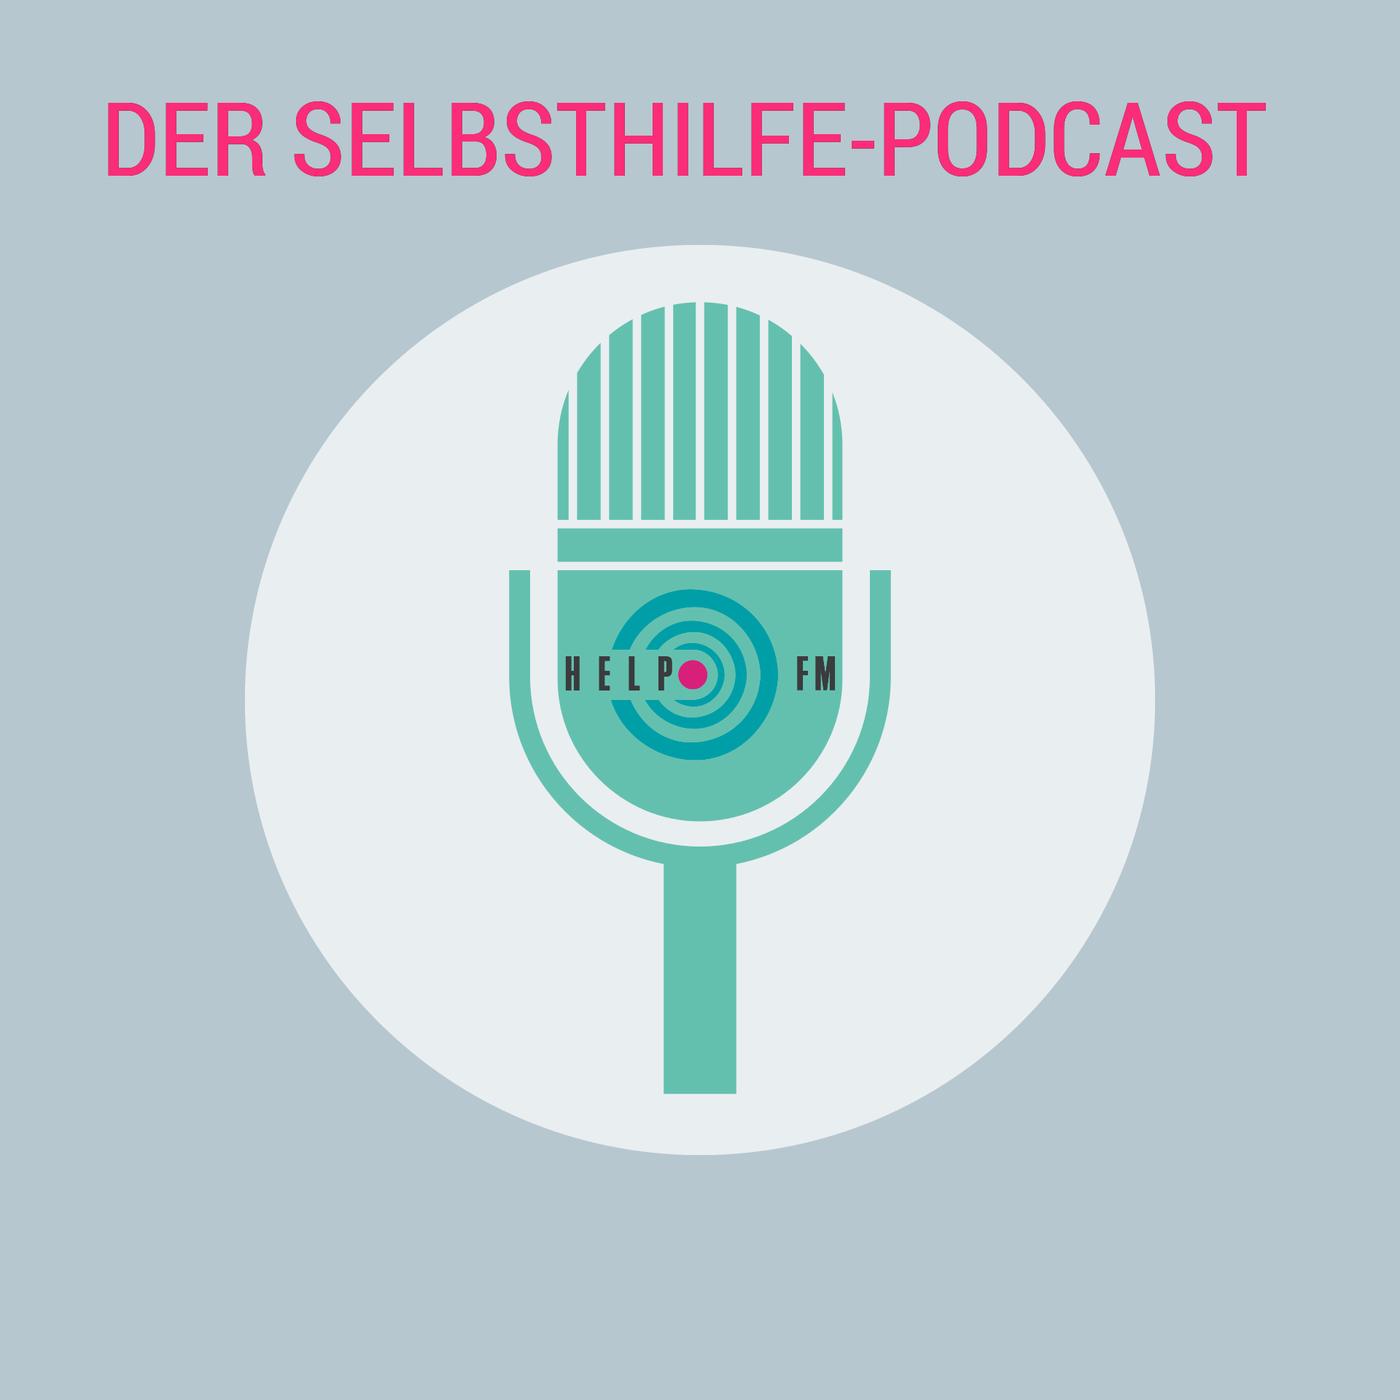 HELP FM - Der Selbsthilfe-Podcast